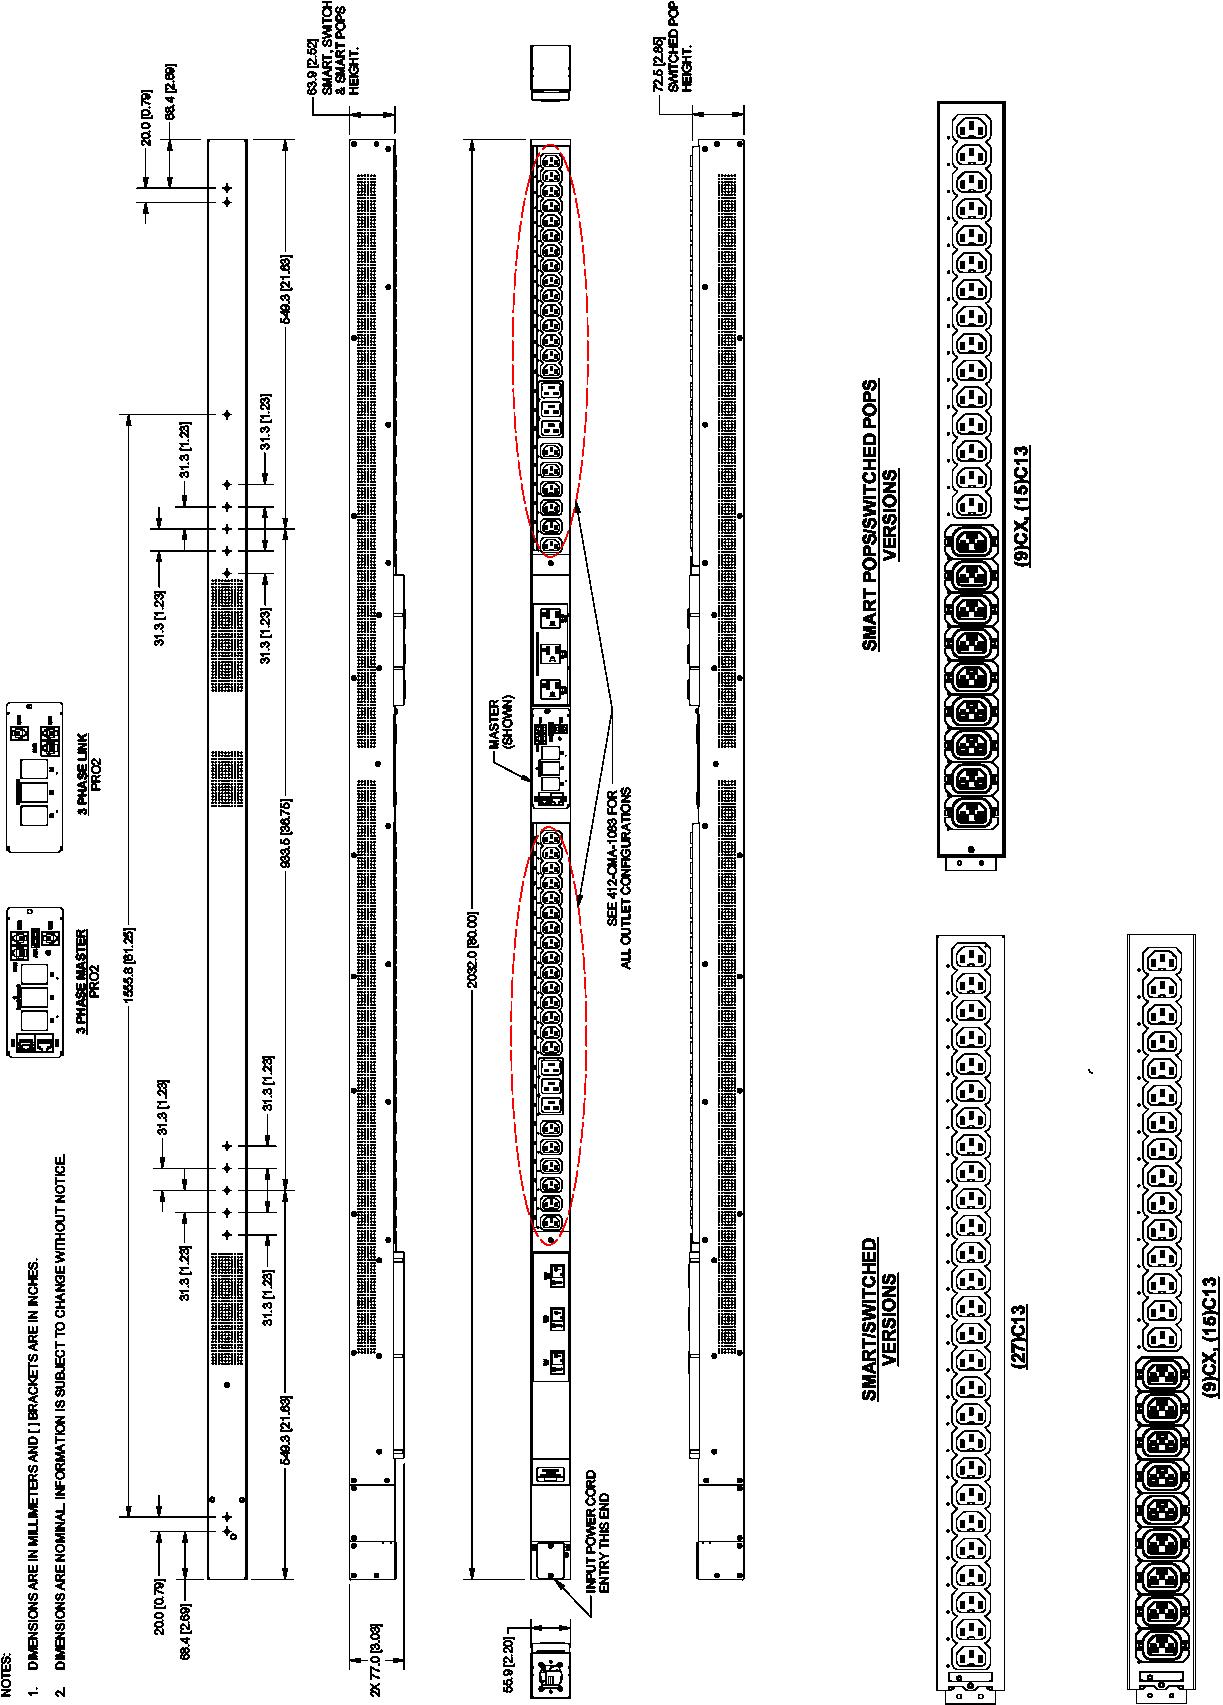 Pro2 Smart Switched C2w48ce 57kw 86kw 36 C13 12c19 L15 30 Wiring Three Phase Diagram Design Hdot Cx